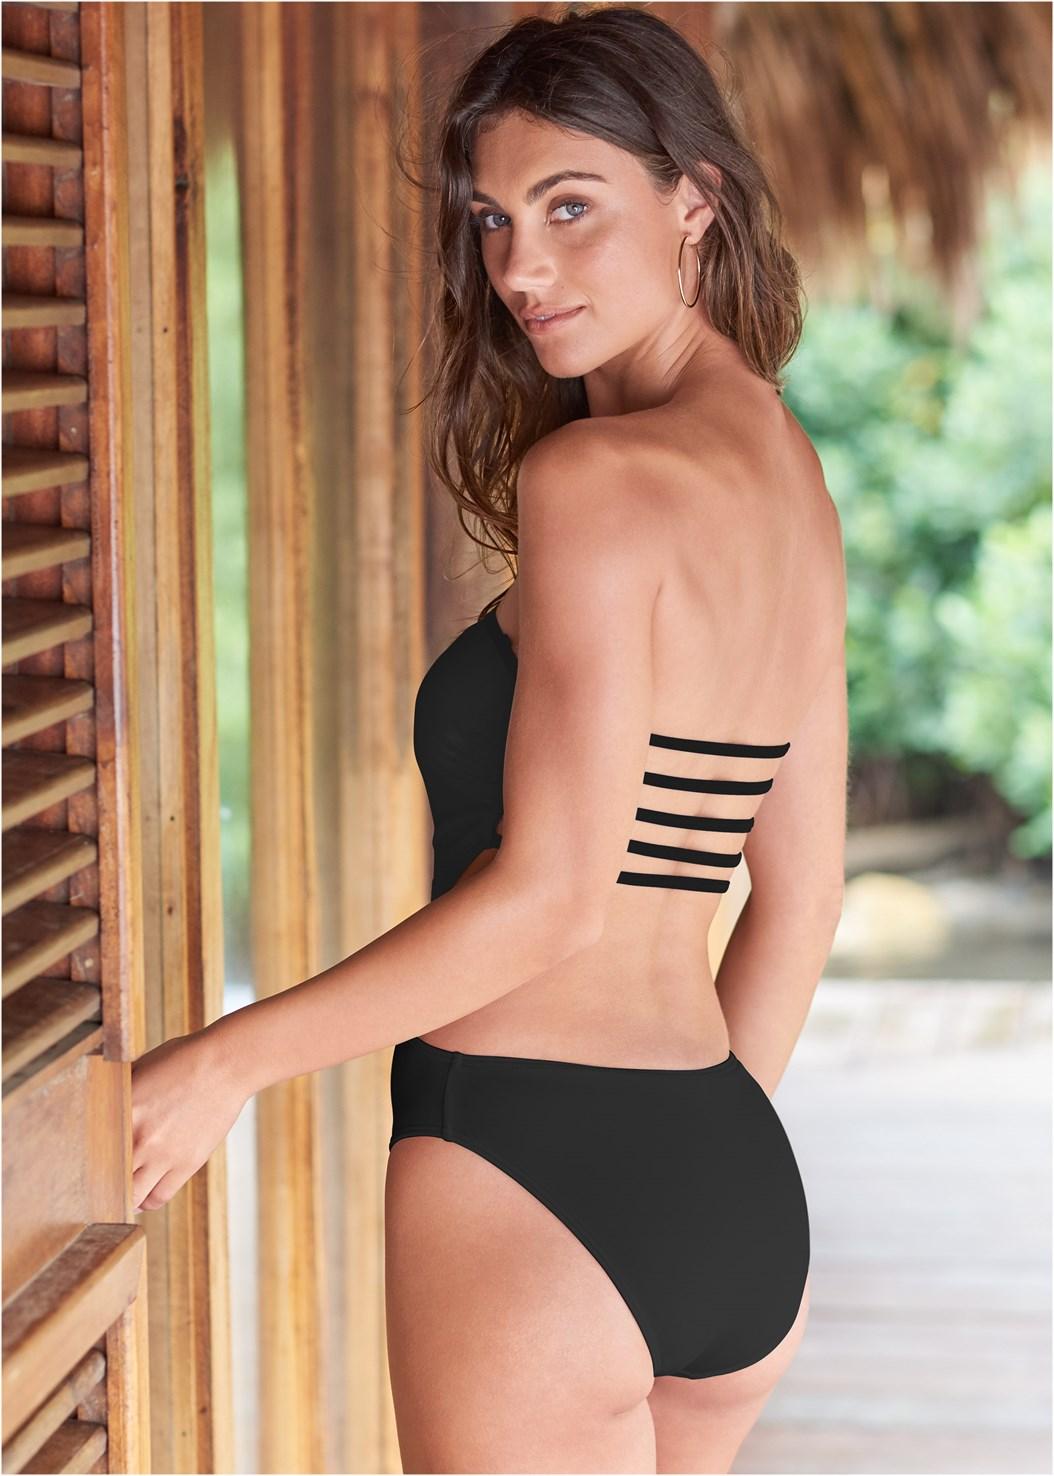 Capri Strap Back Monokini,Strapless Jumpsuit,Flirty Romper Cover-Up,Keyhole Back Cover-Up